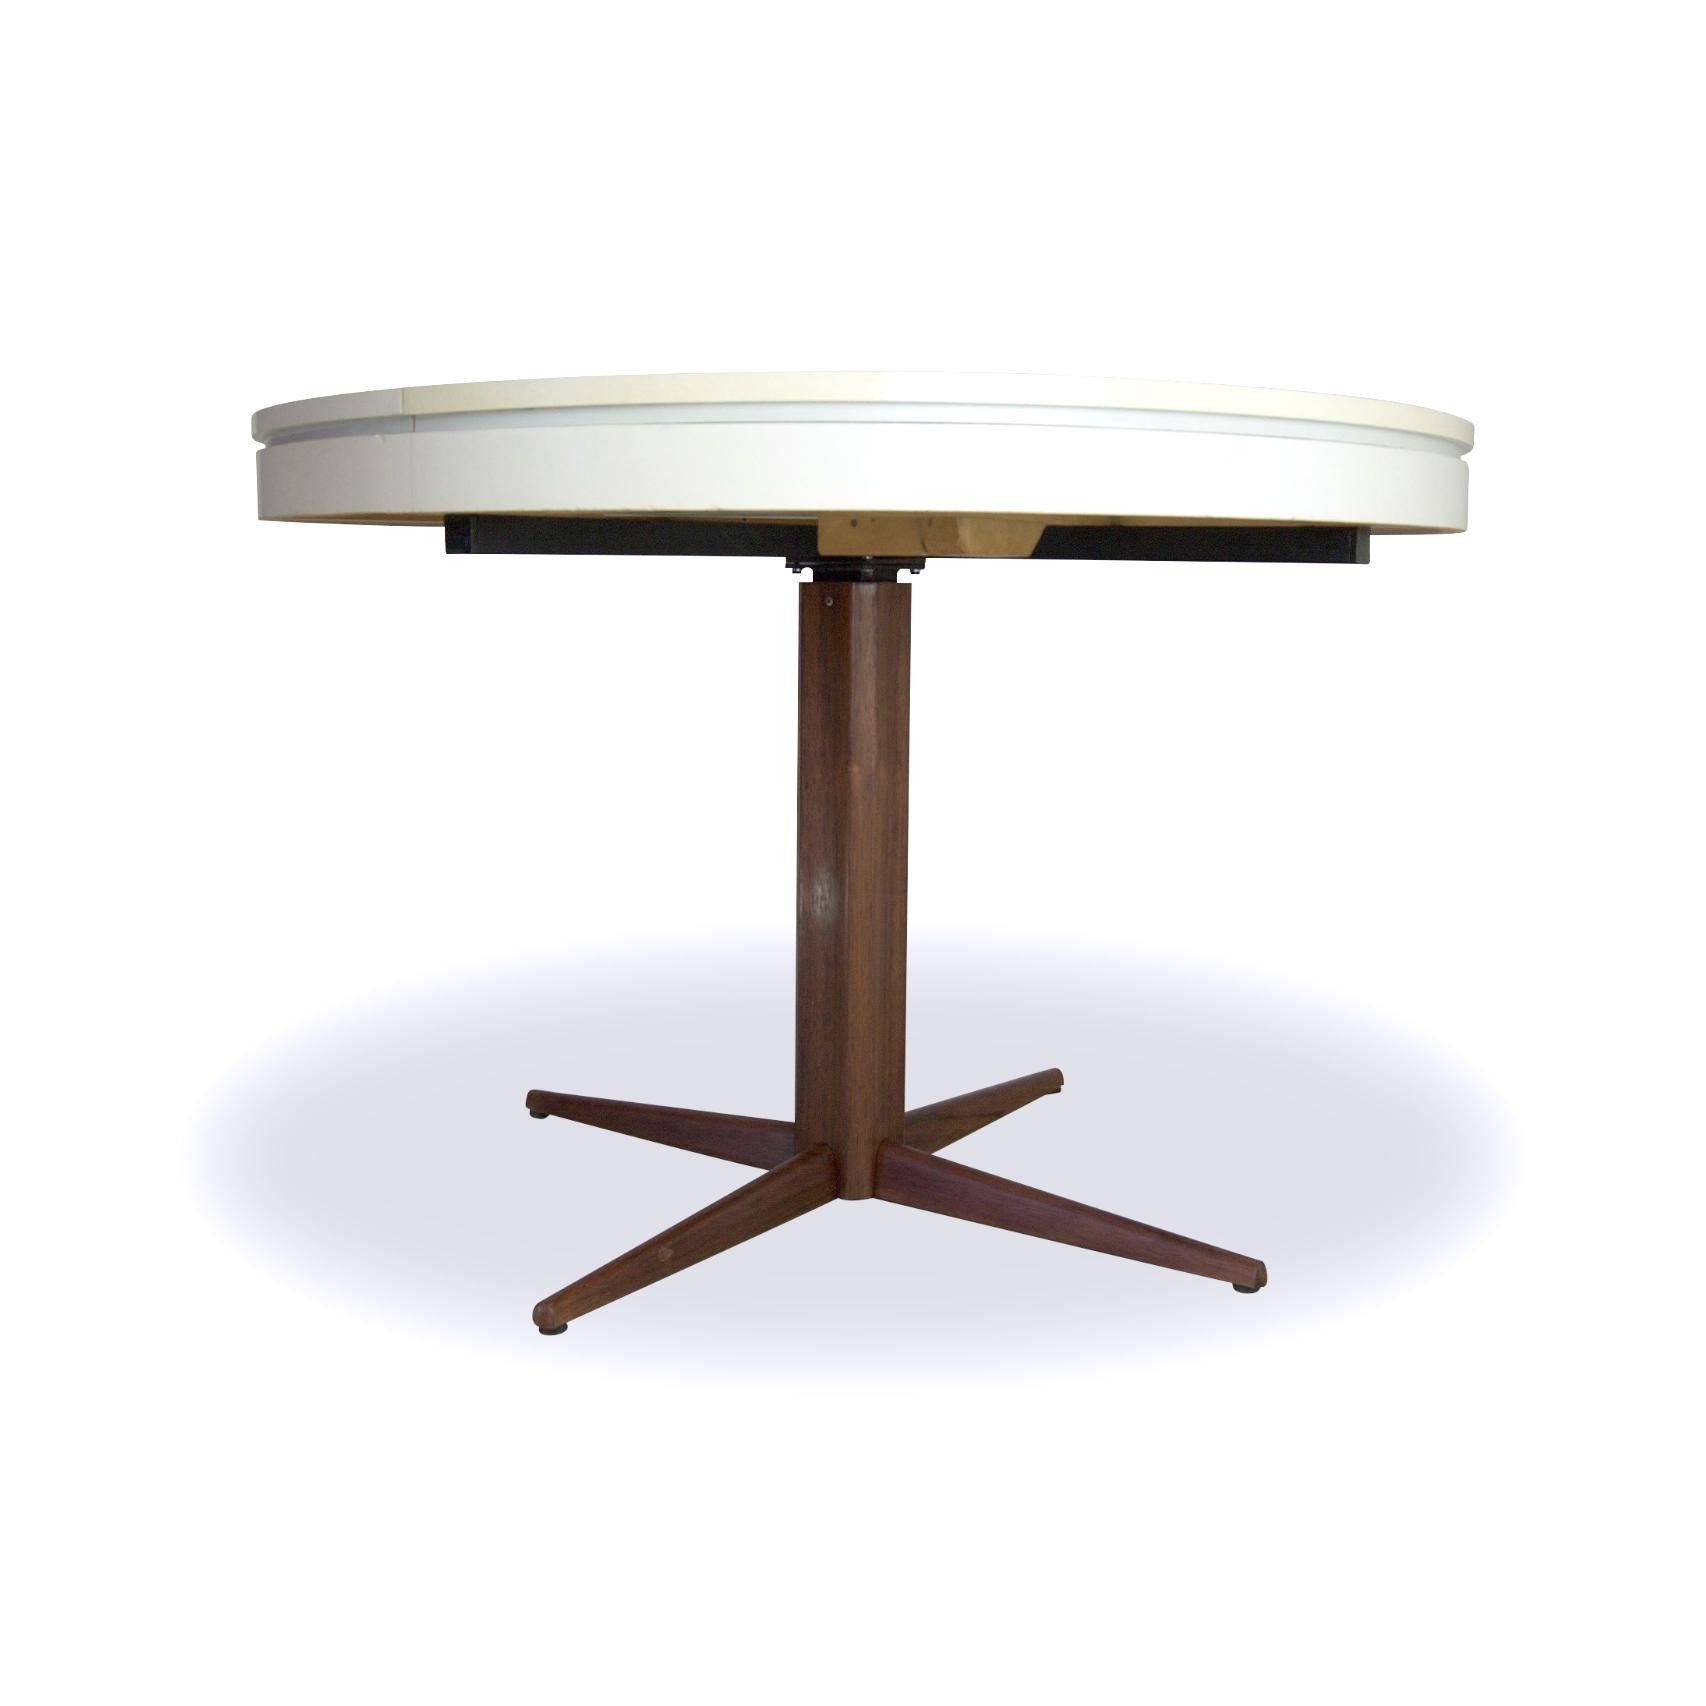 Woonkamer tafel rond salontafels woonkamer salontafel sets witte